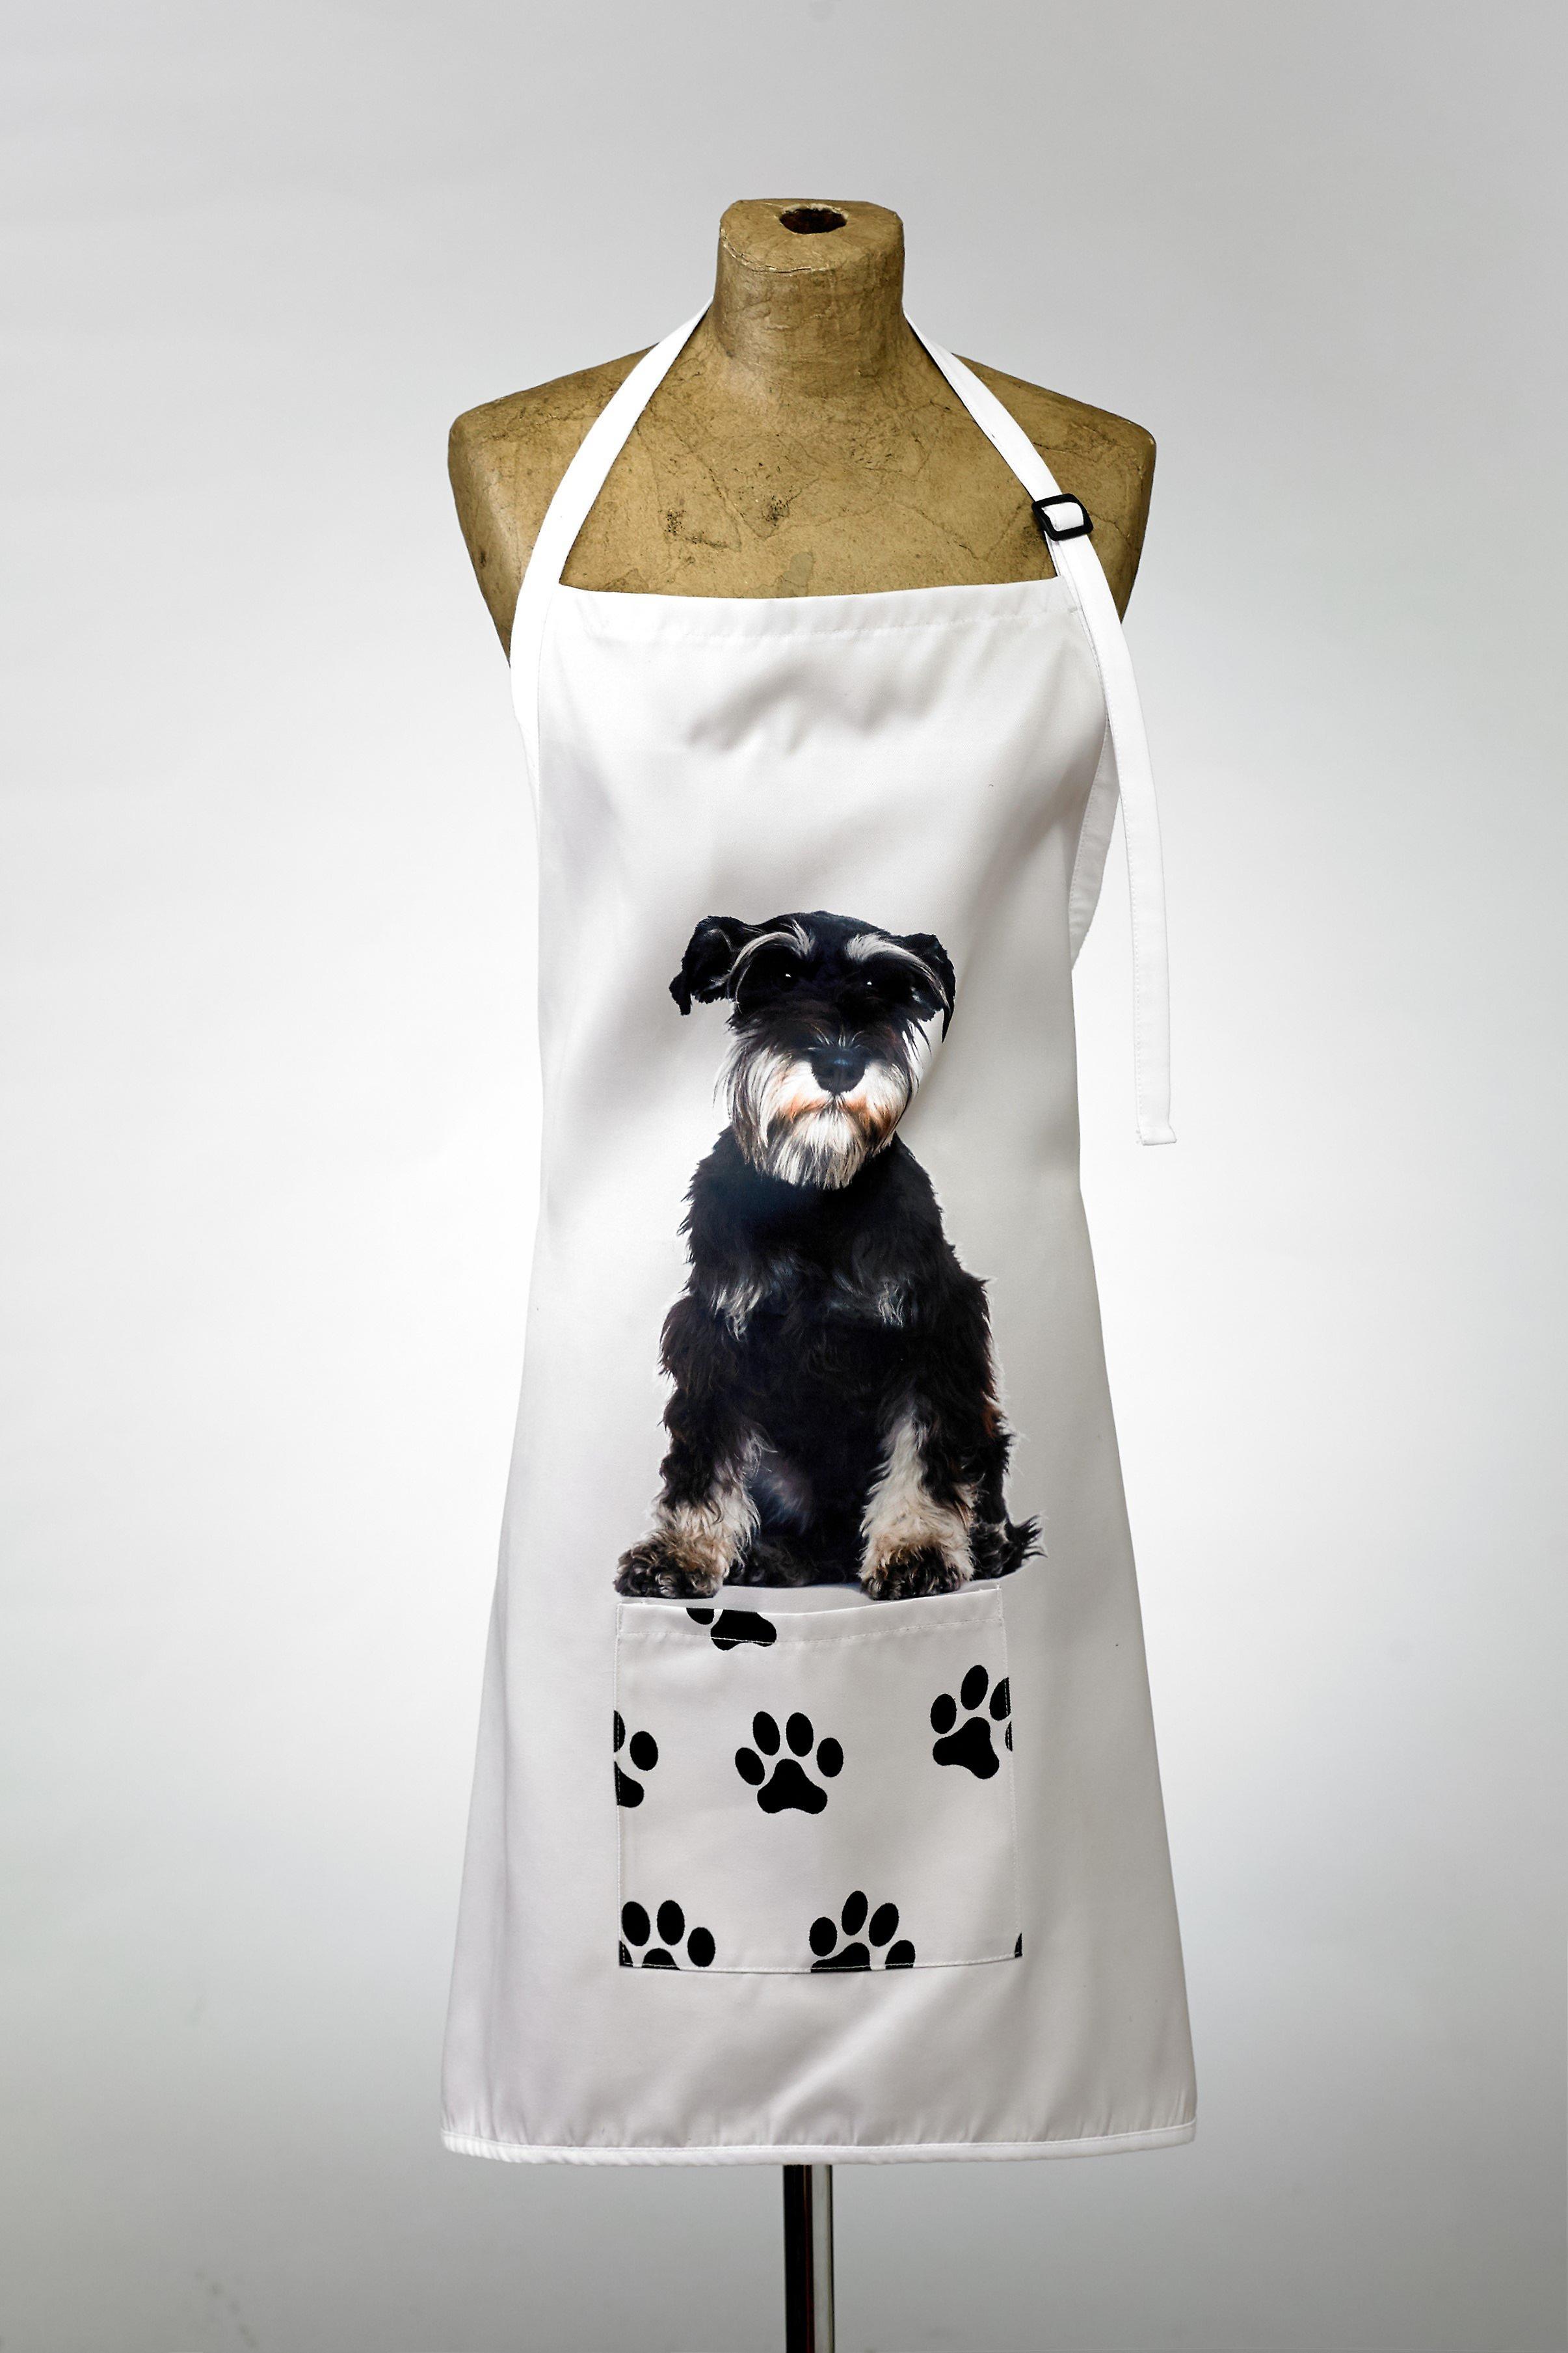 Adorable schnauzer design apron